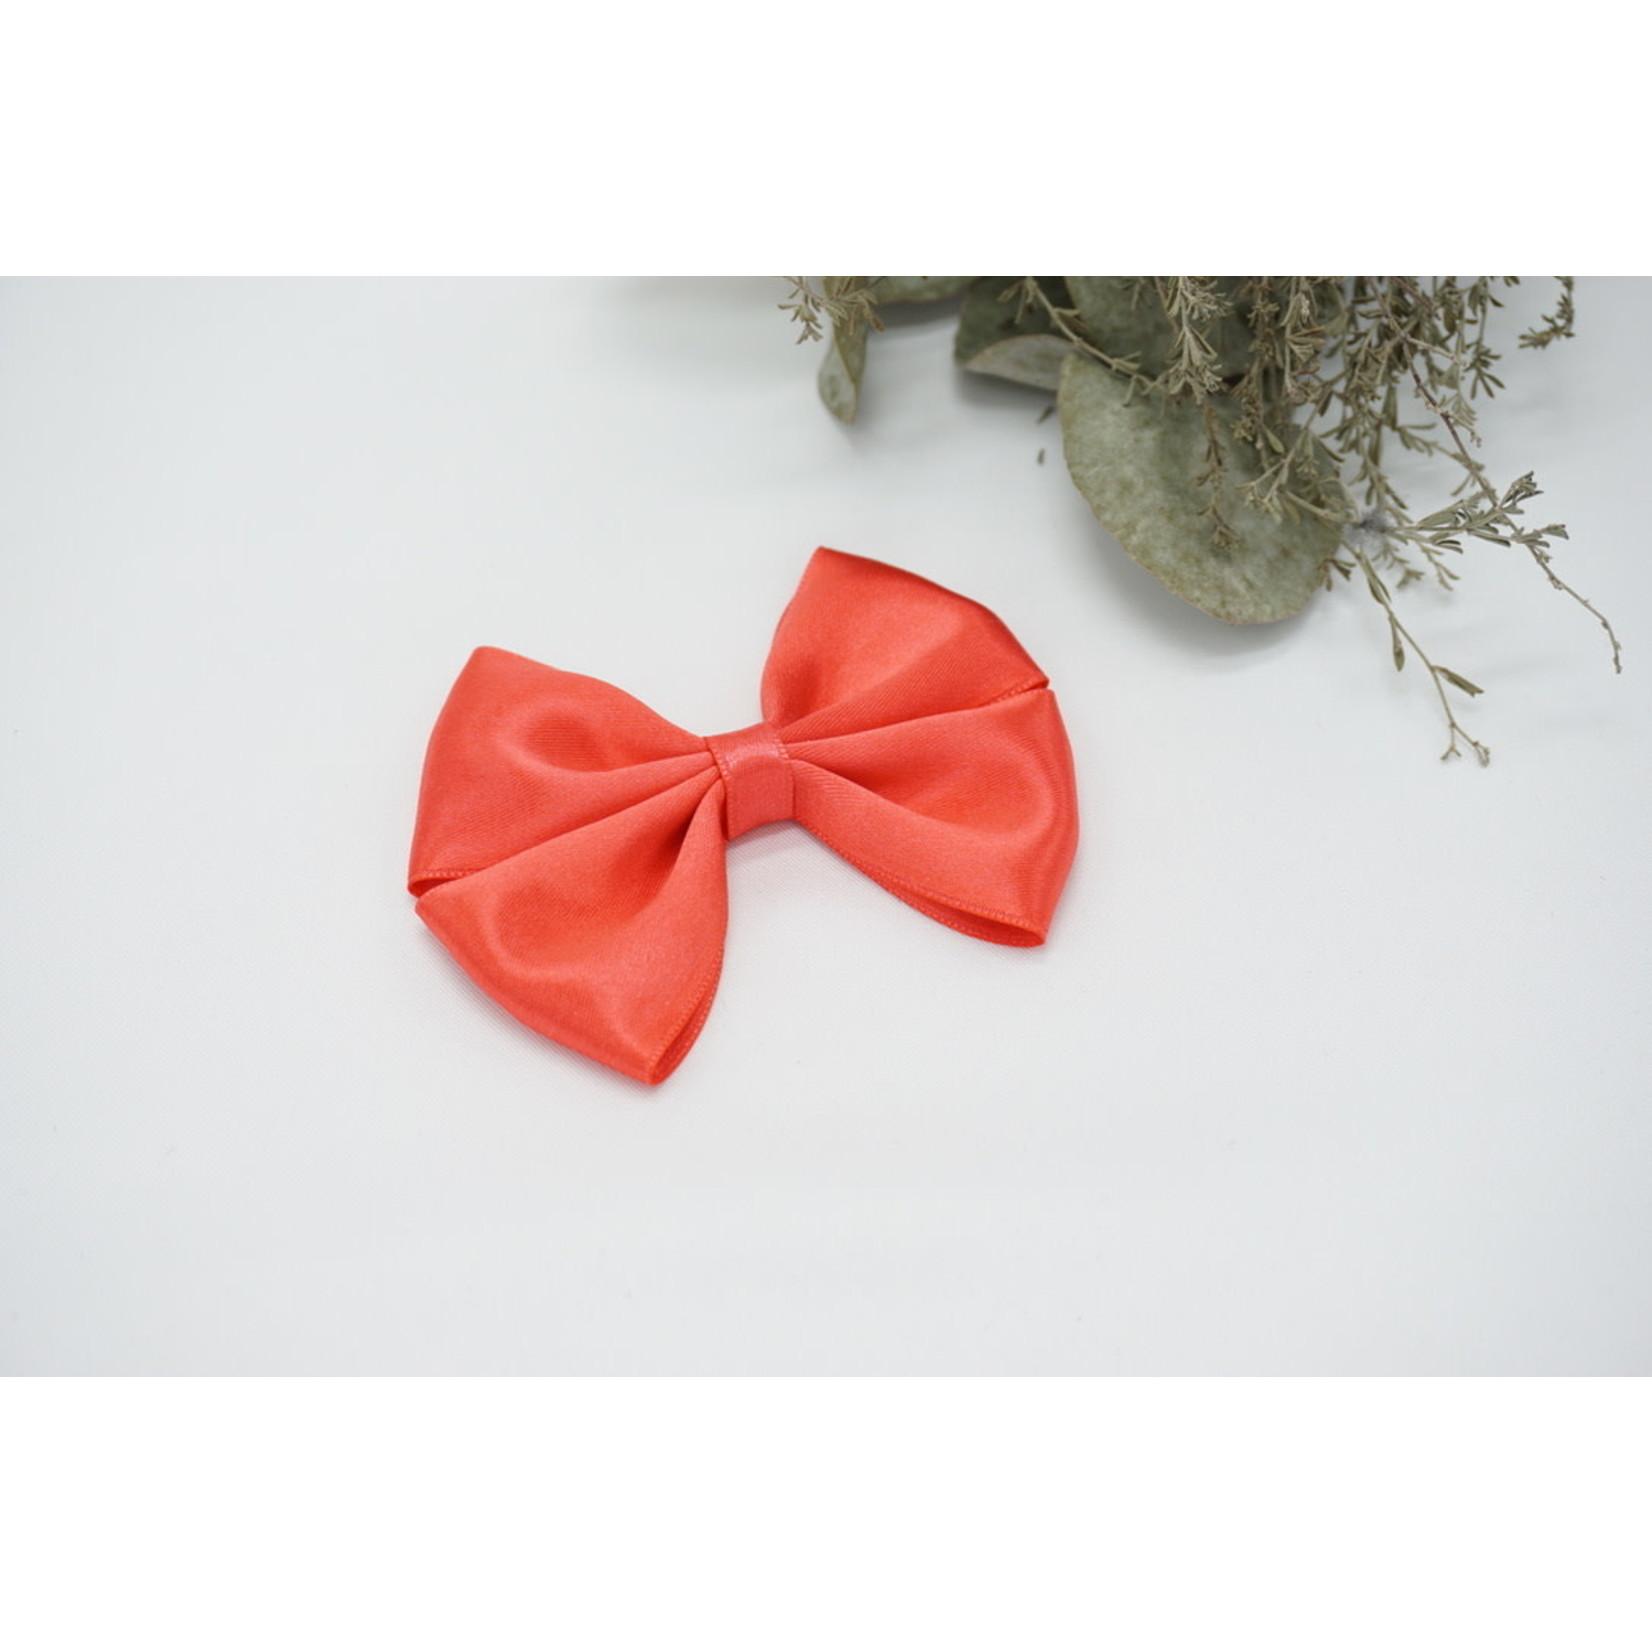 Petite Zara Satin Bow - Coral